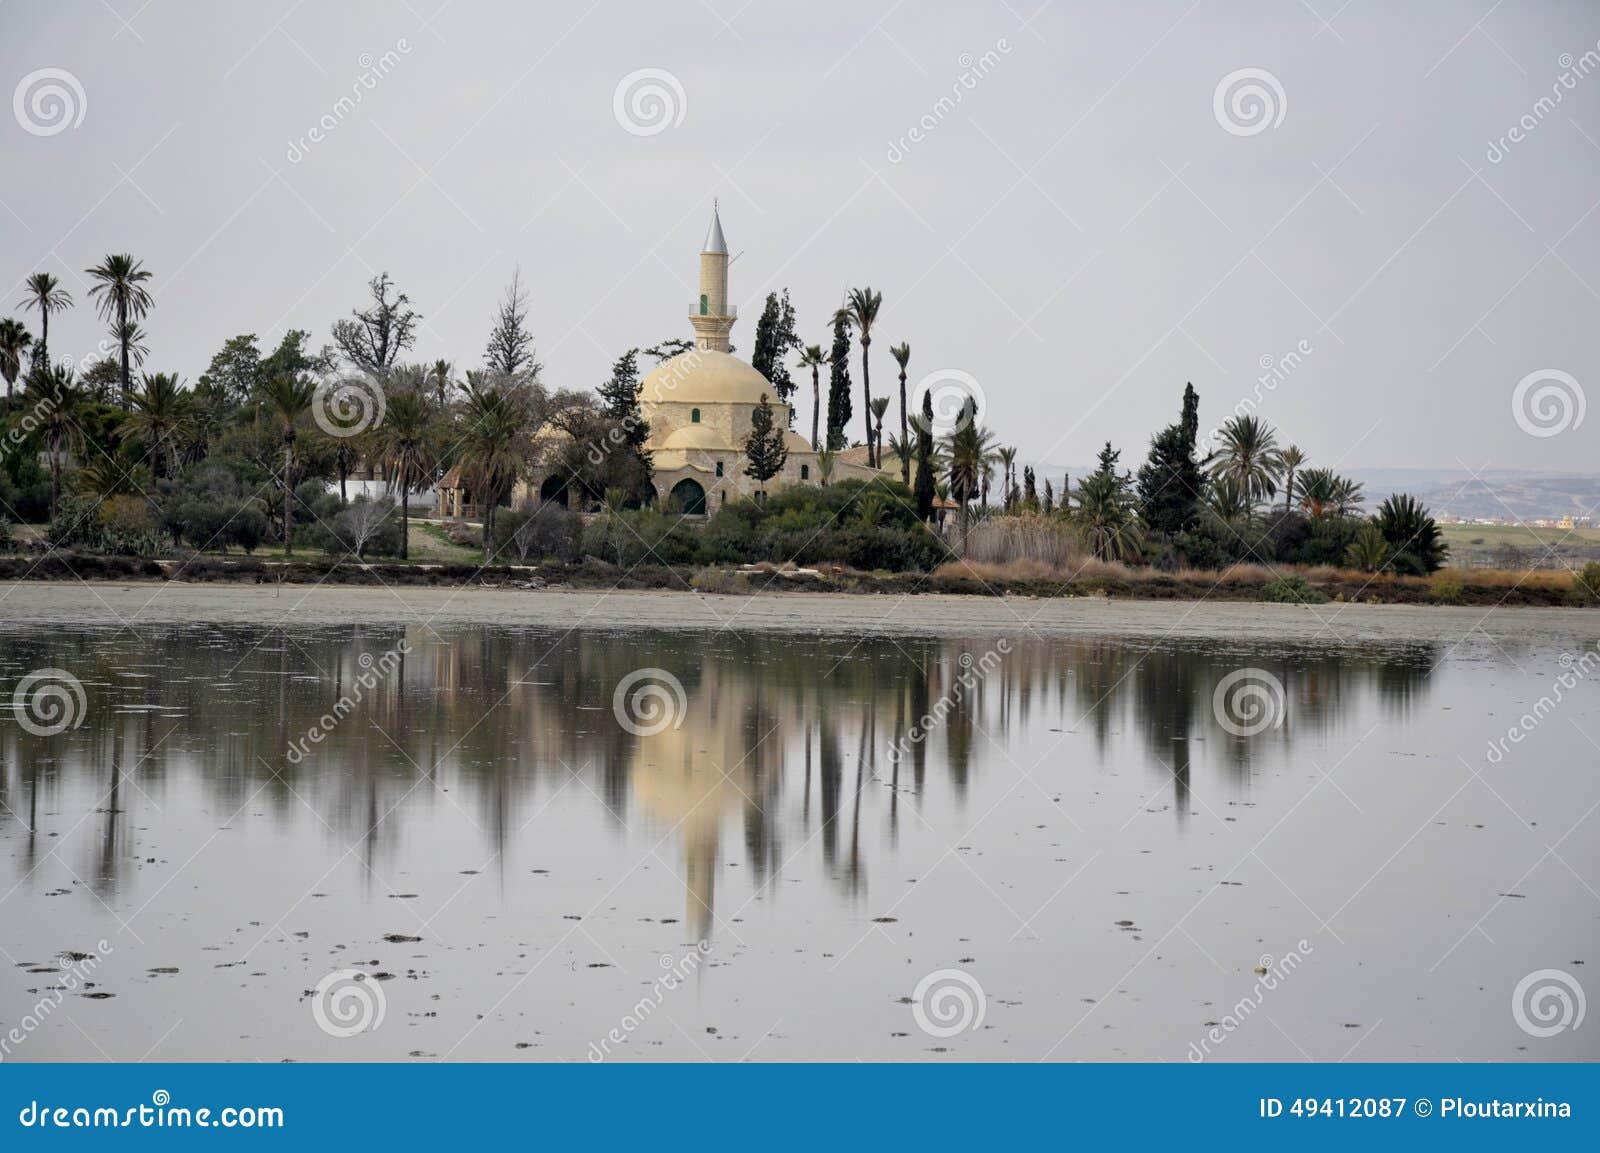 Download Hala Sultan Tekke In Zypern Stockbild - Bild von kirche, horizontal: 49412087